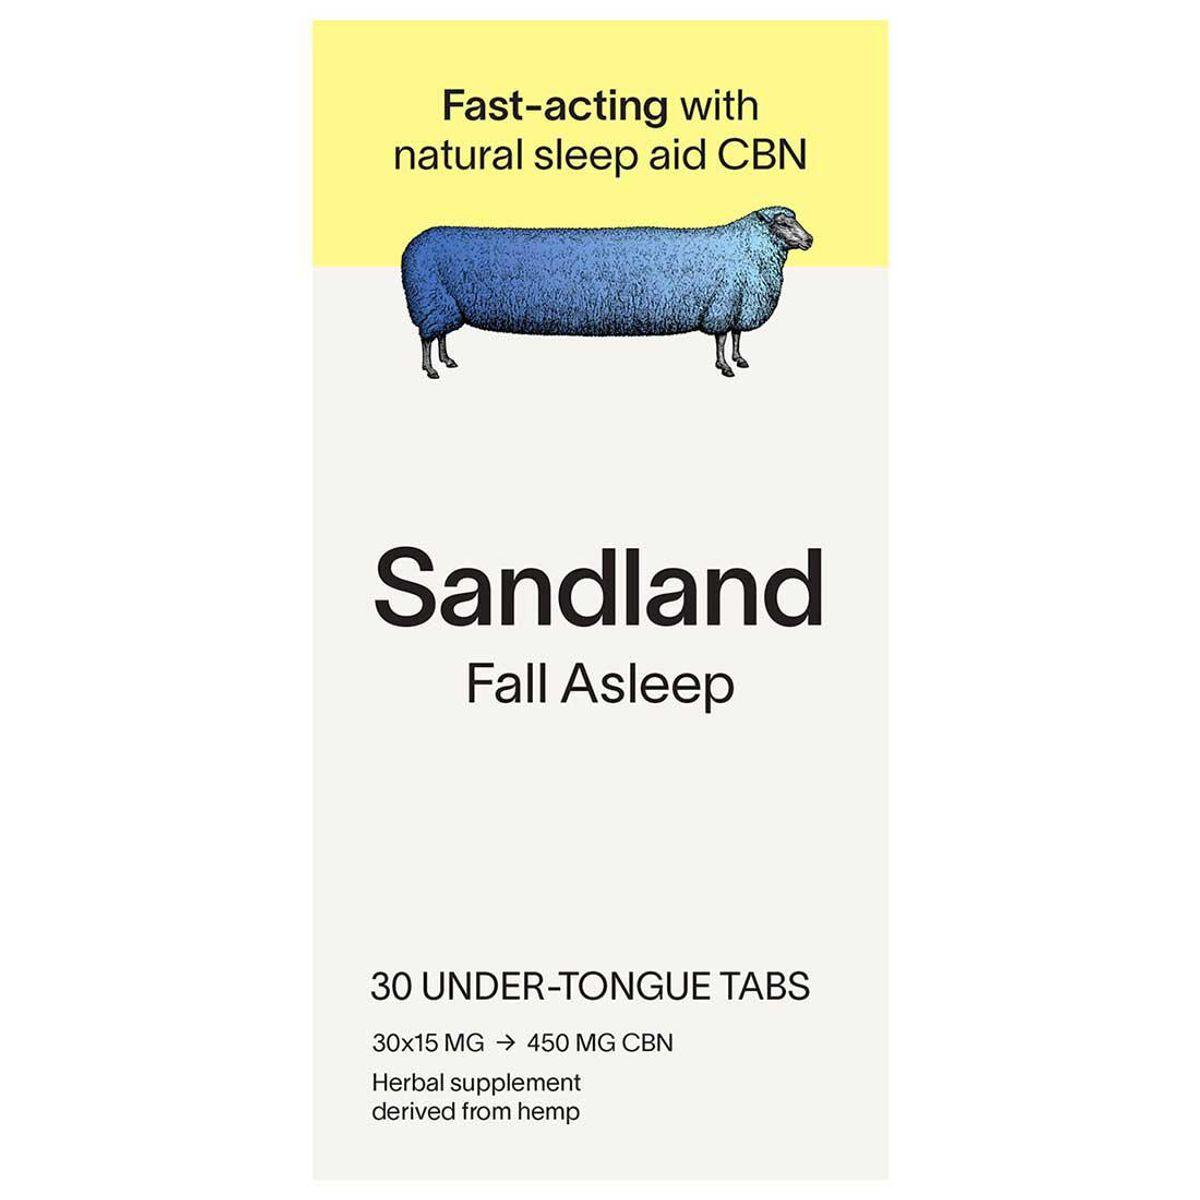 sandland fall asleep